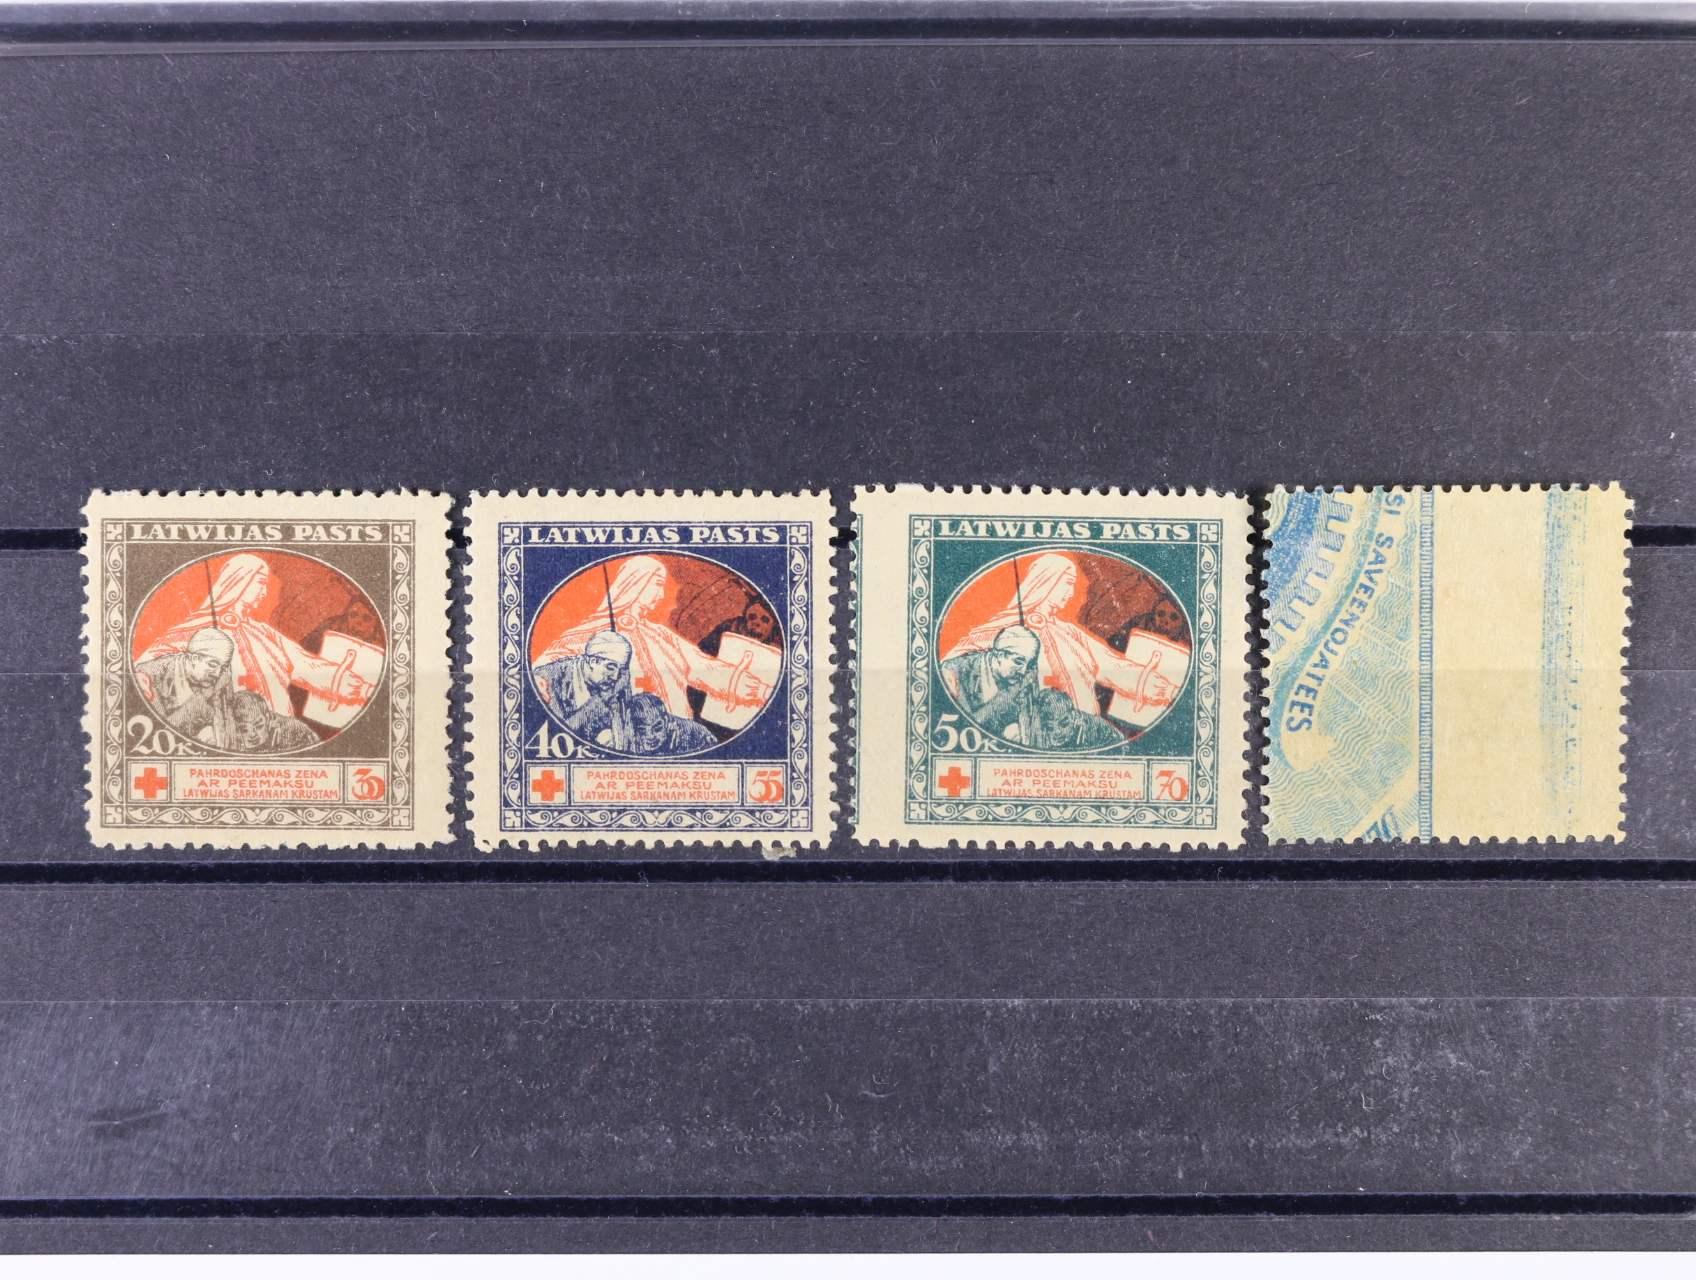 zn. Mi. č. 65y - 68y (modrý podtisk, 140 EUR, zajímavé